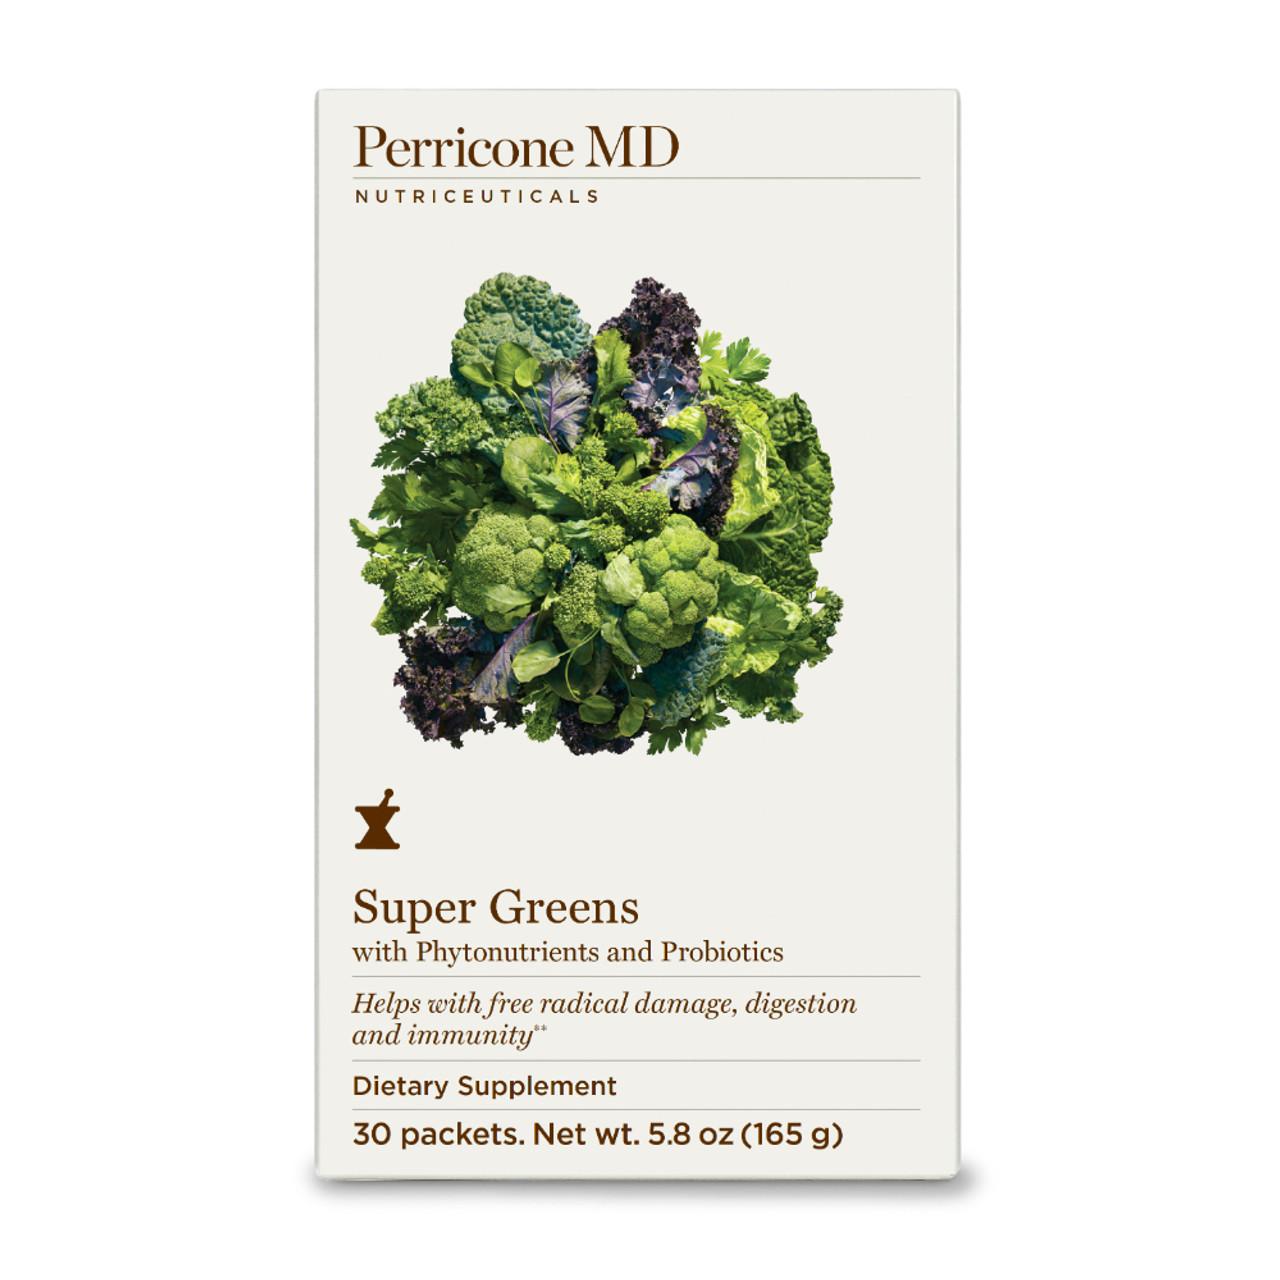 Perricone MD Super Greens BeautifiedYou.com